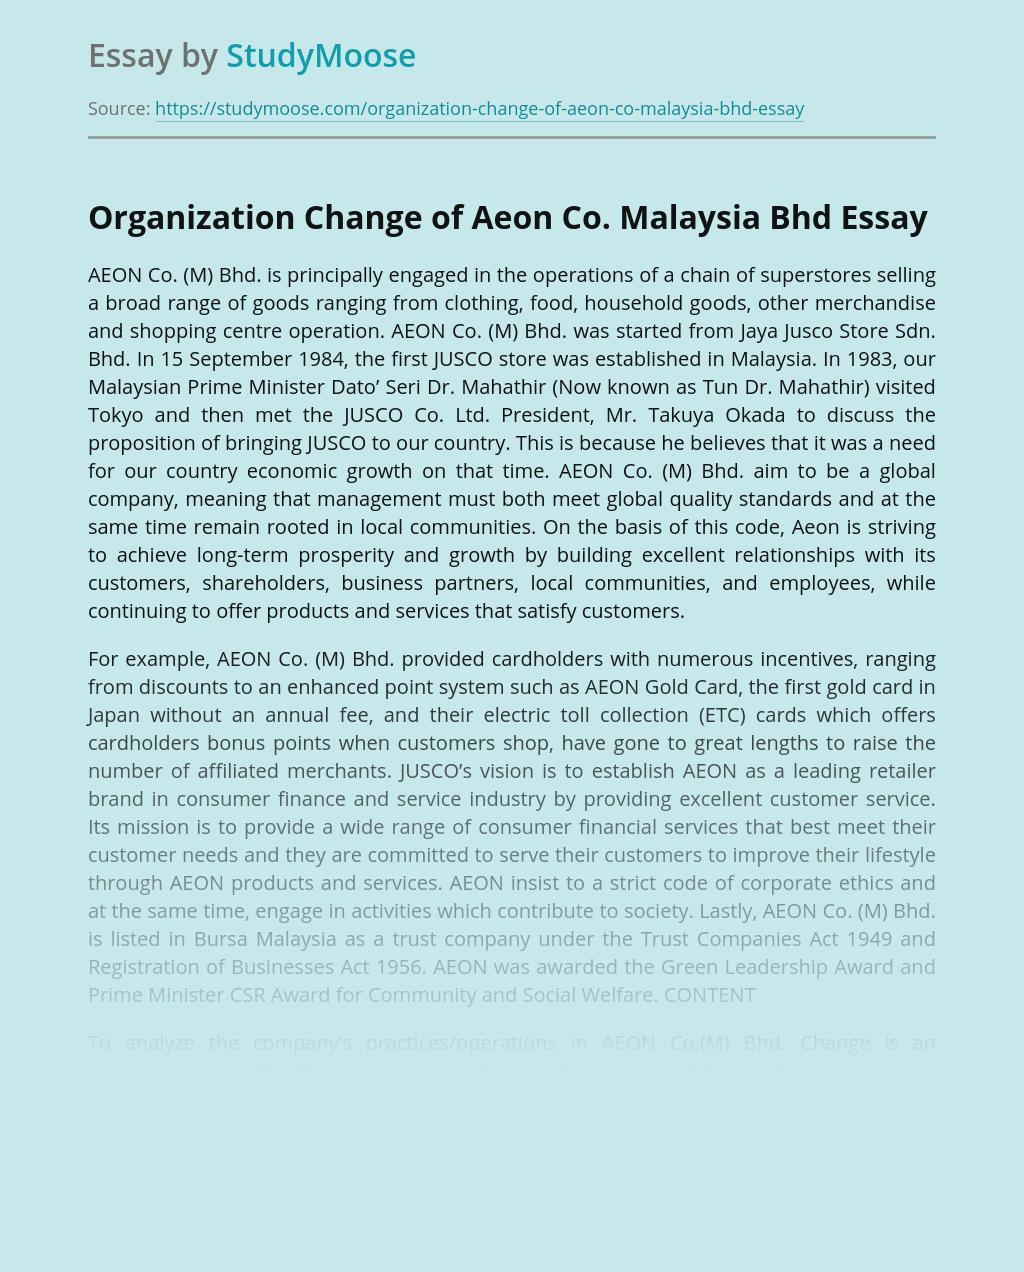 Organization Change of Aeon Co. Malaysia Bhd